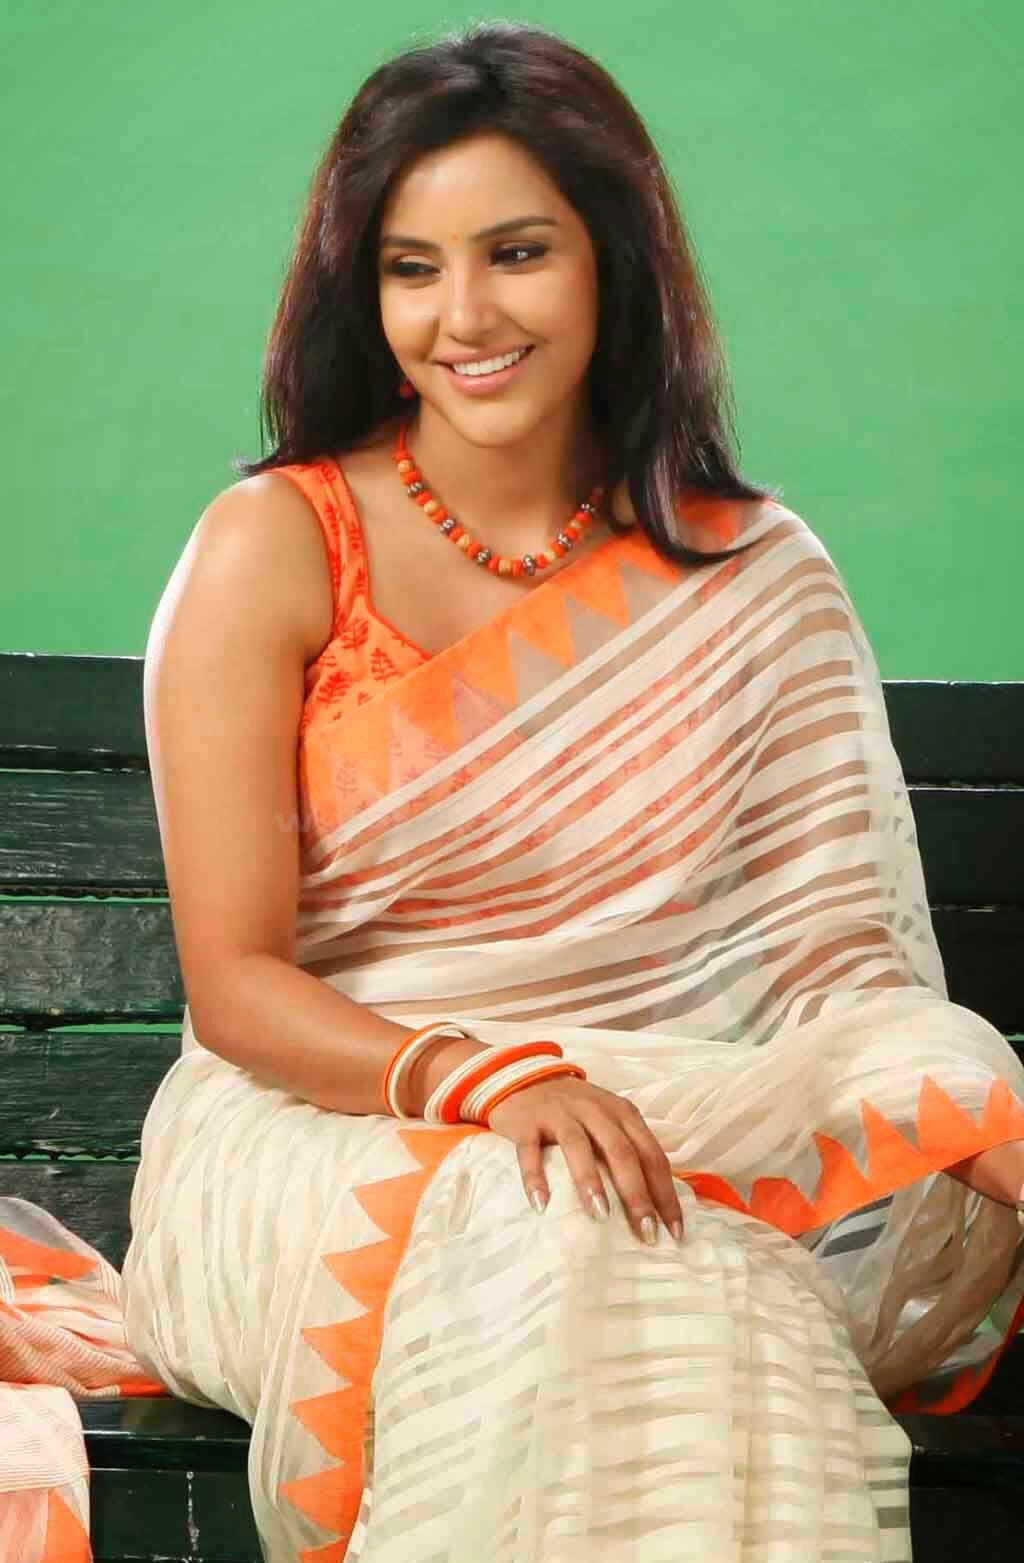 hd wallpapers: priya anand in half saree,priya anand in saree,priya